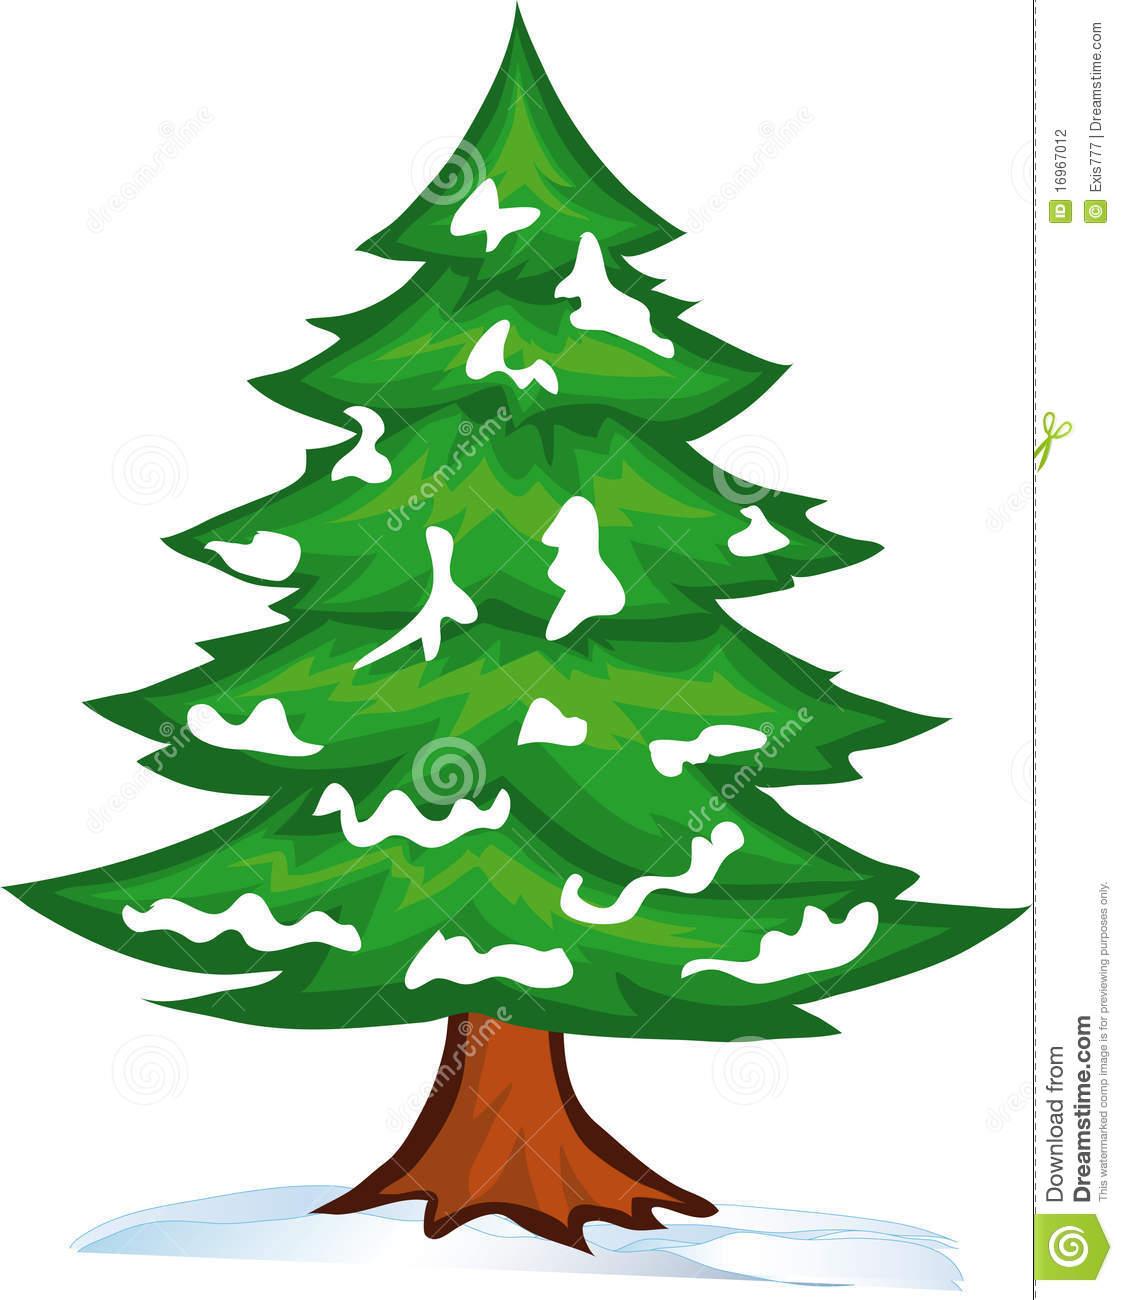 Winter Pine Trees Clipart .-Winter Pine Trees Clipart .-14